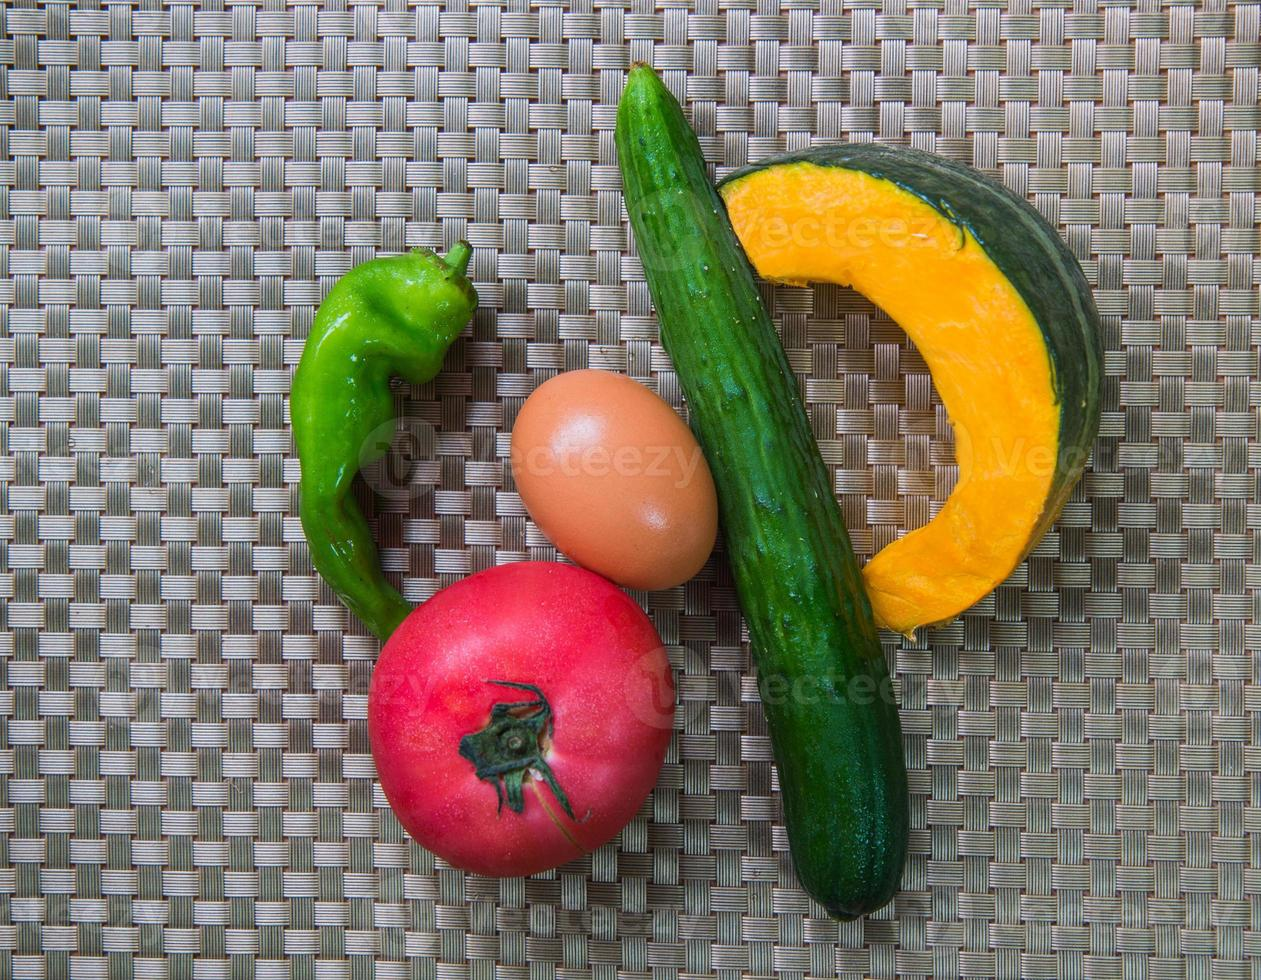 Japan vegetables photo